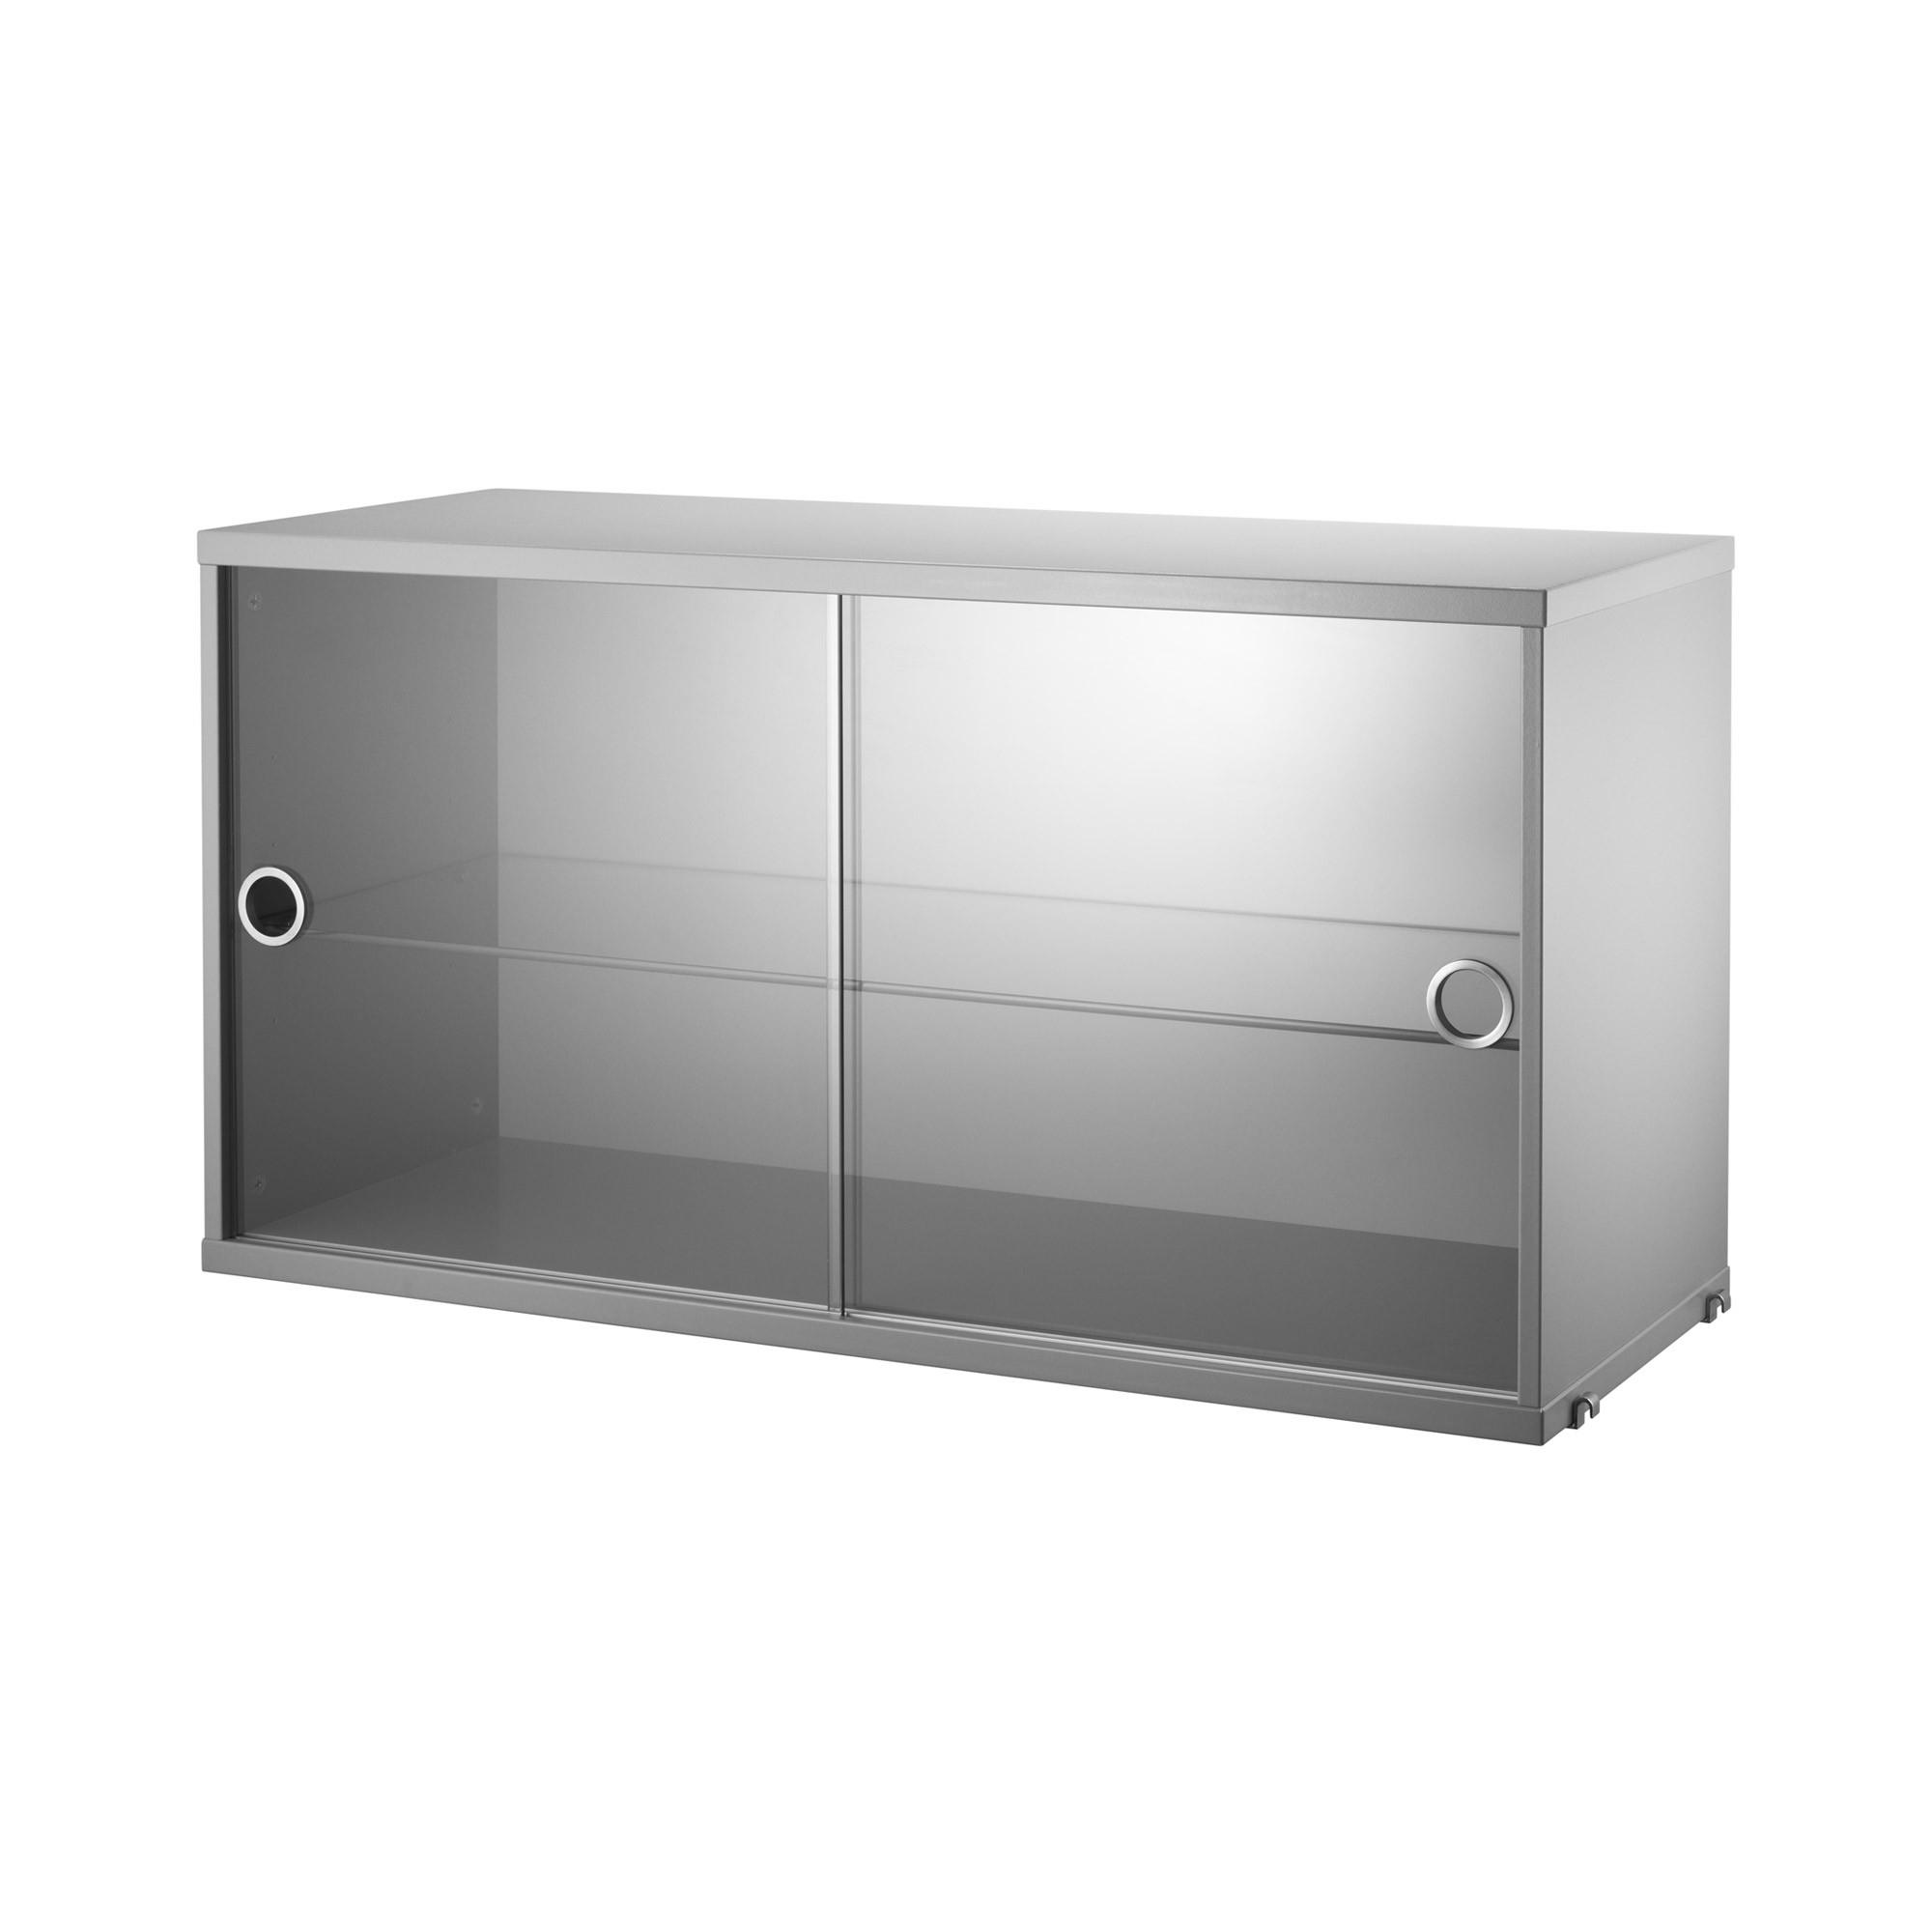 Shelf With Sliding Glass Doorsstring display cabinet with sliding glass doors skandium